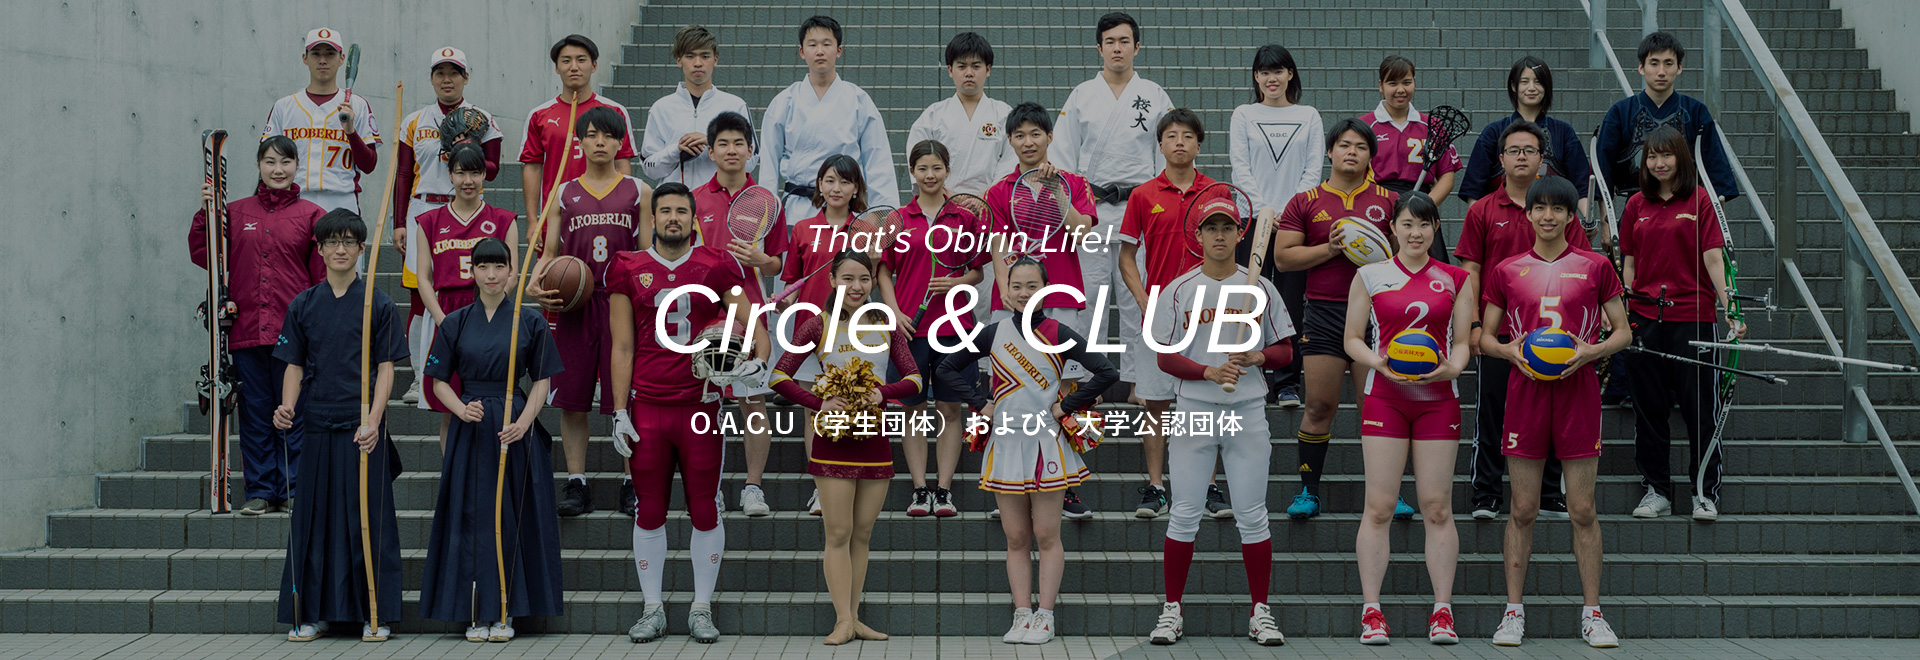 That's Obirin Life! Circle & CLUB O.A.C.U(学生団体)および、大学公認団体